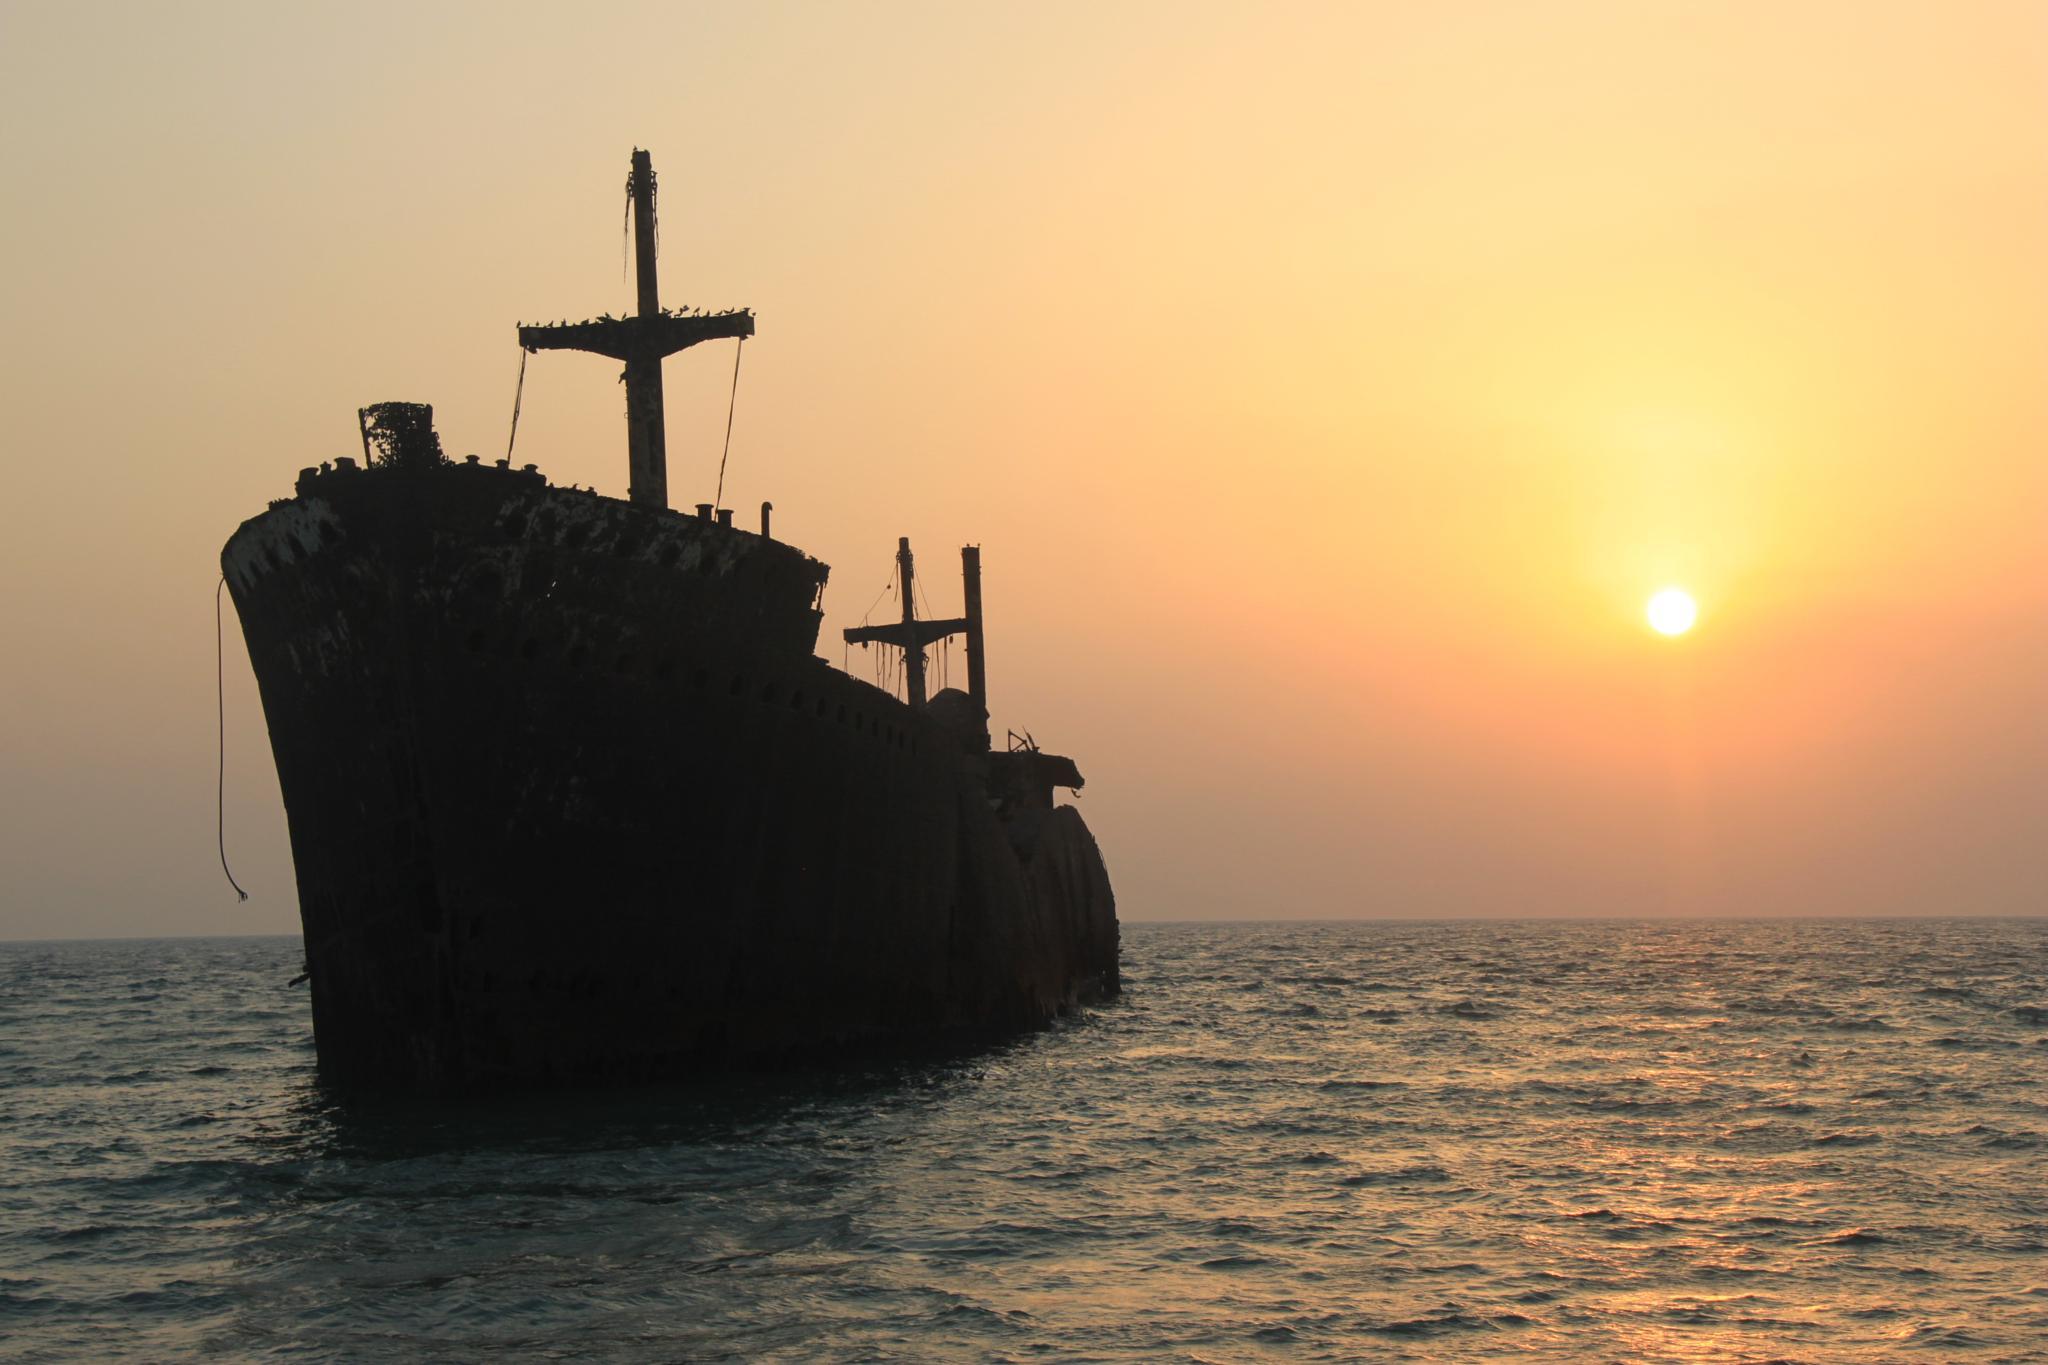 greek ship(kish_iran) by samanpic